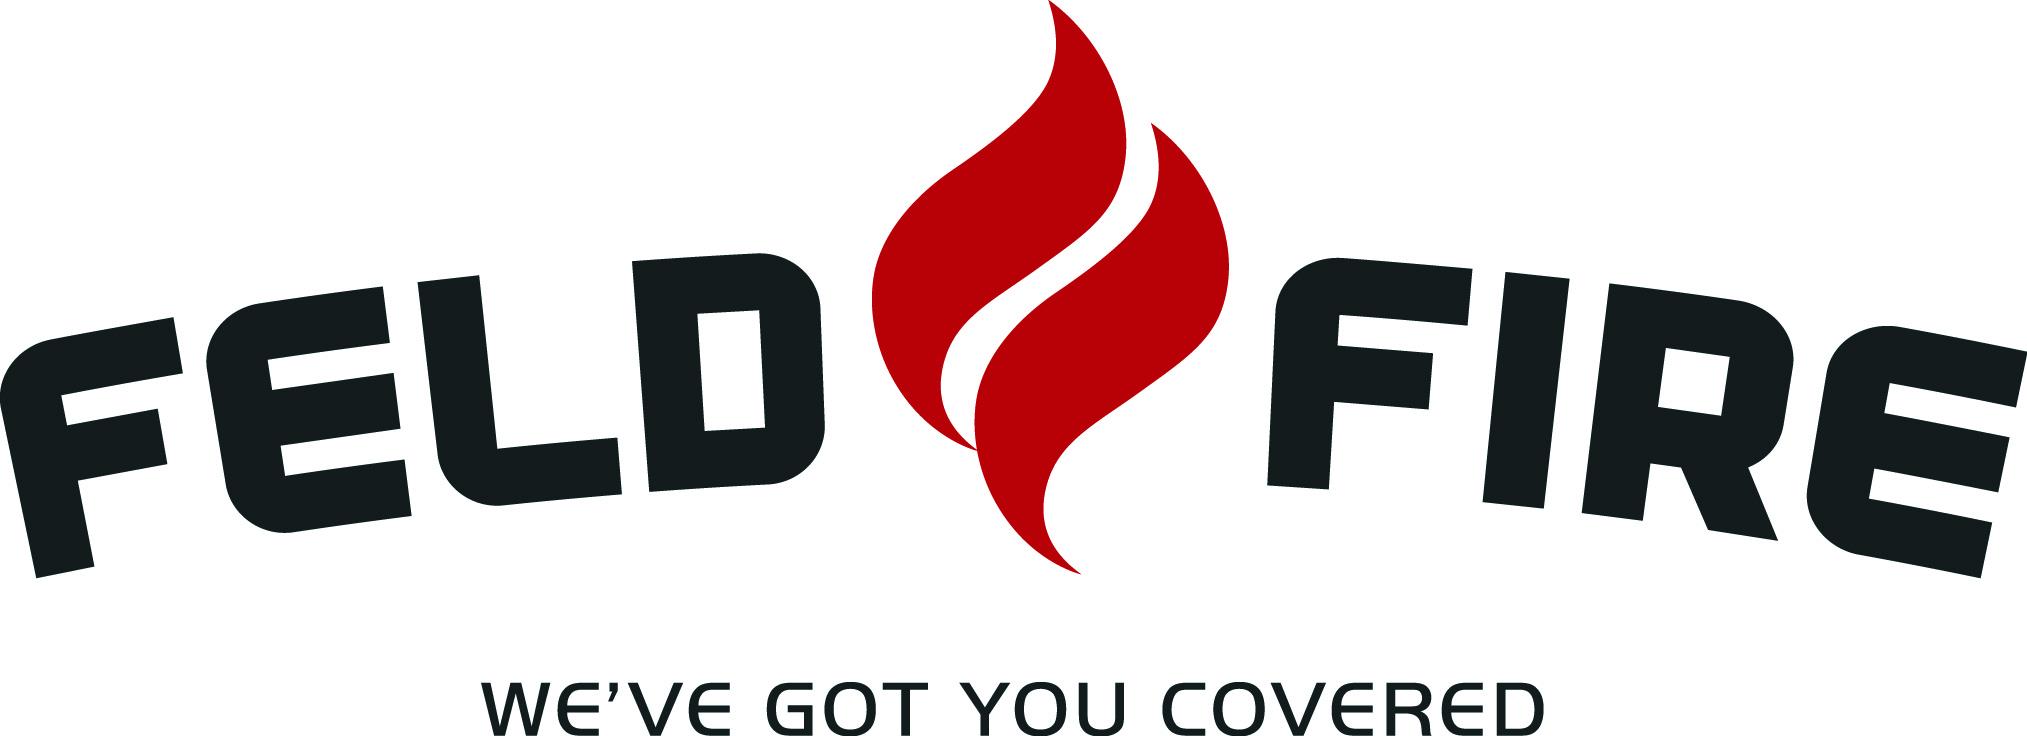 2671-LOGO_FELD_FIRE_2C_C2D2.jpg